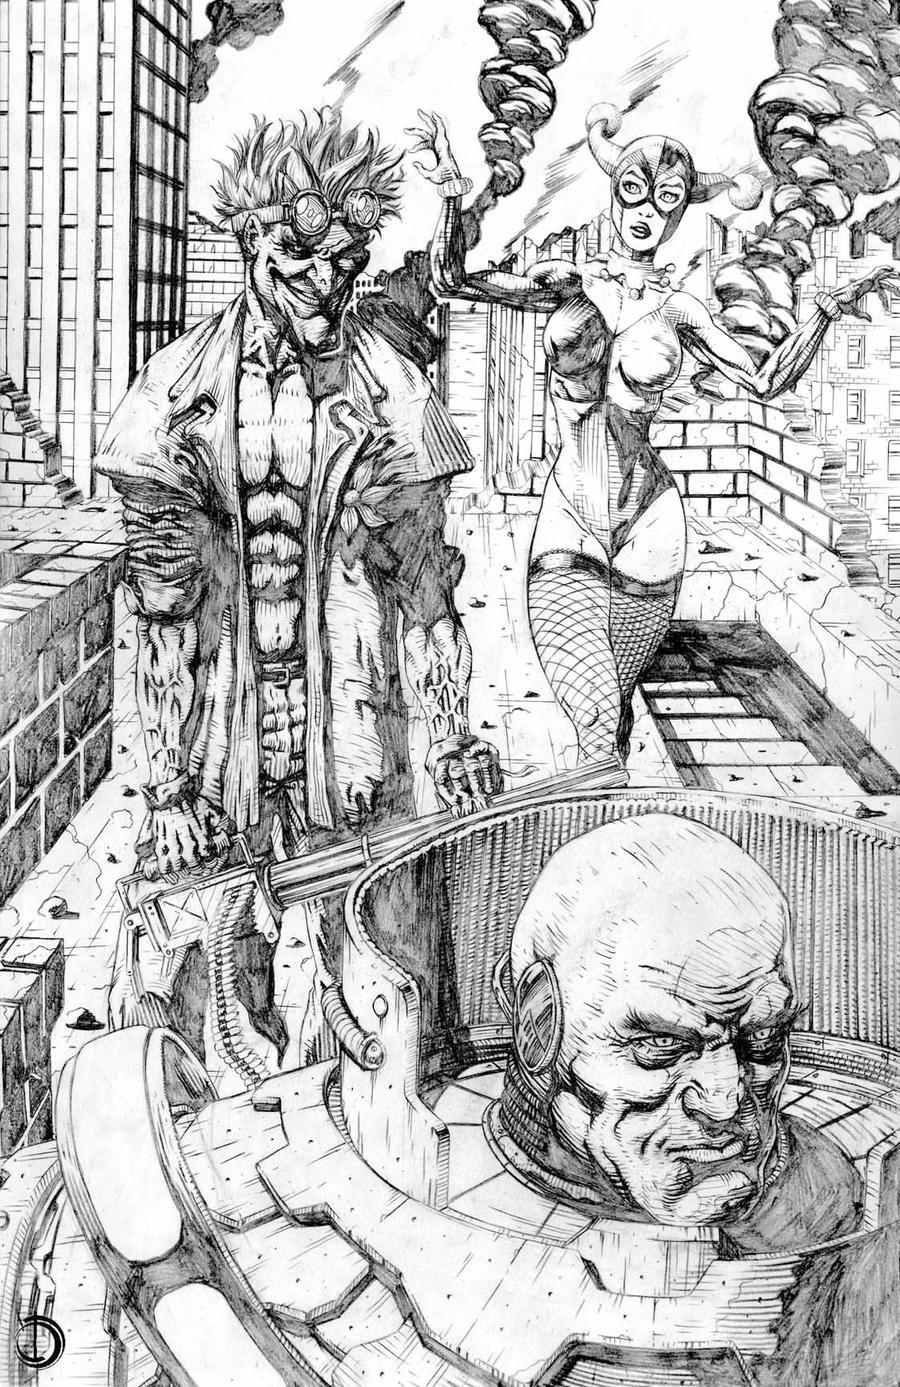 Lex and The  Joker by santiagocomics